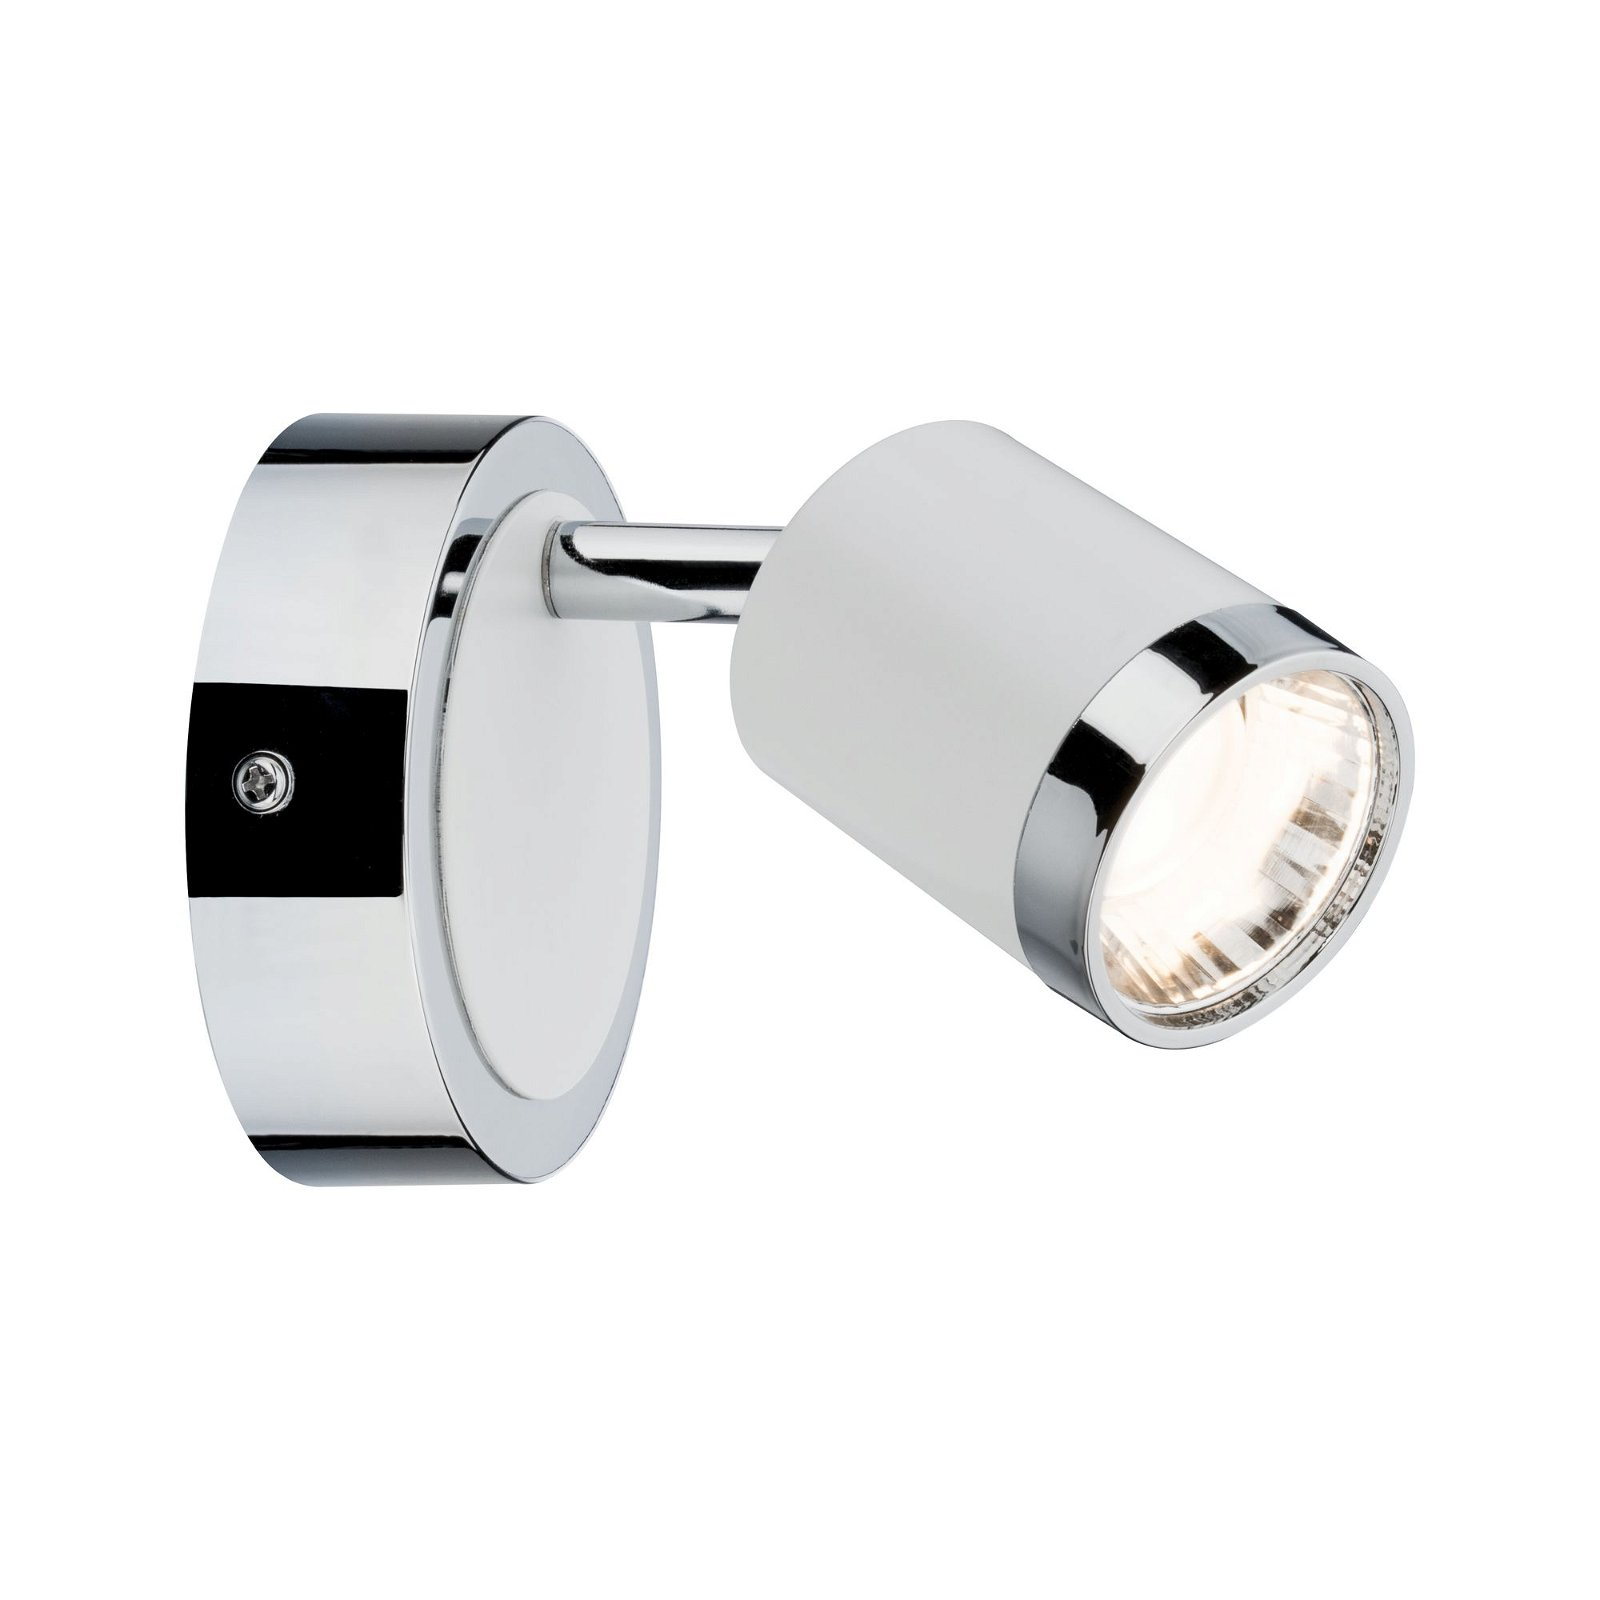 Smart Home BLE Strahler Coimbra 1-flammig Tunable White Chrom